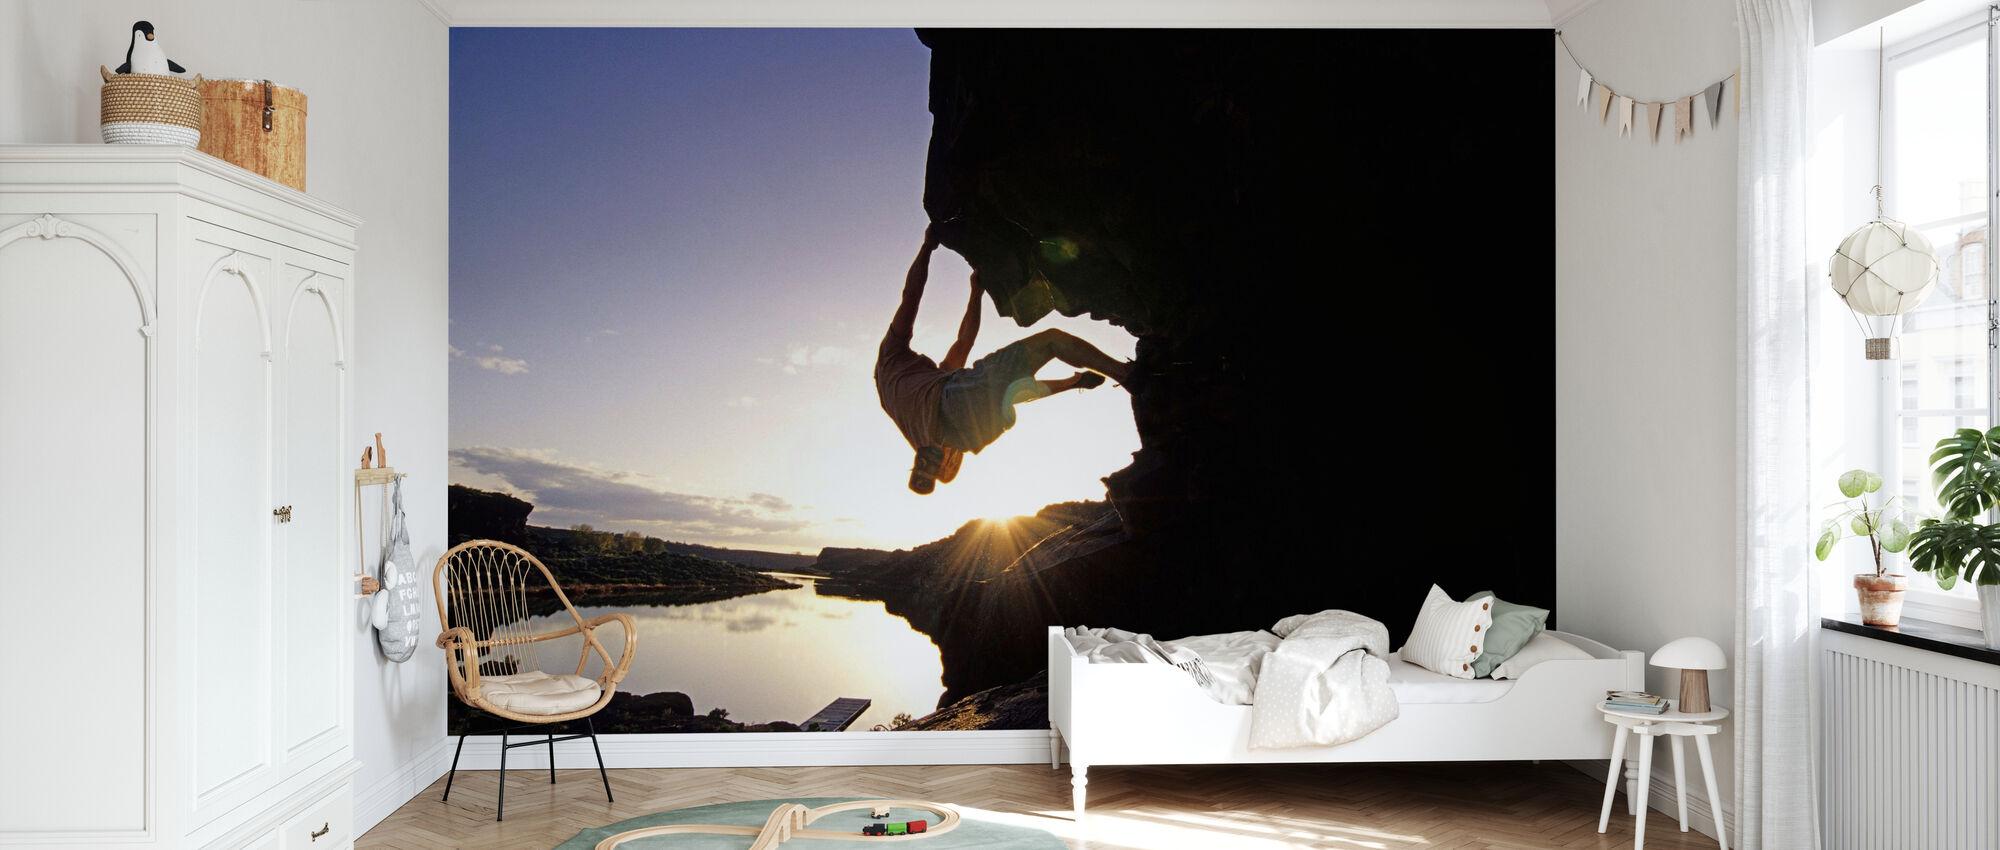 Bouldering in Twin Falls - Wallpaper - Kids Room